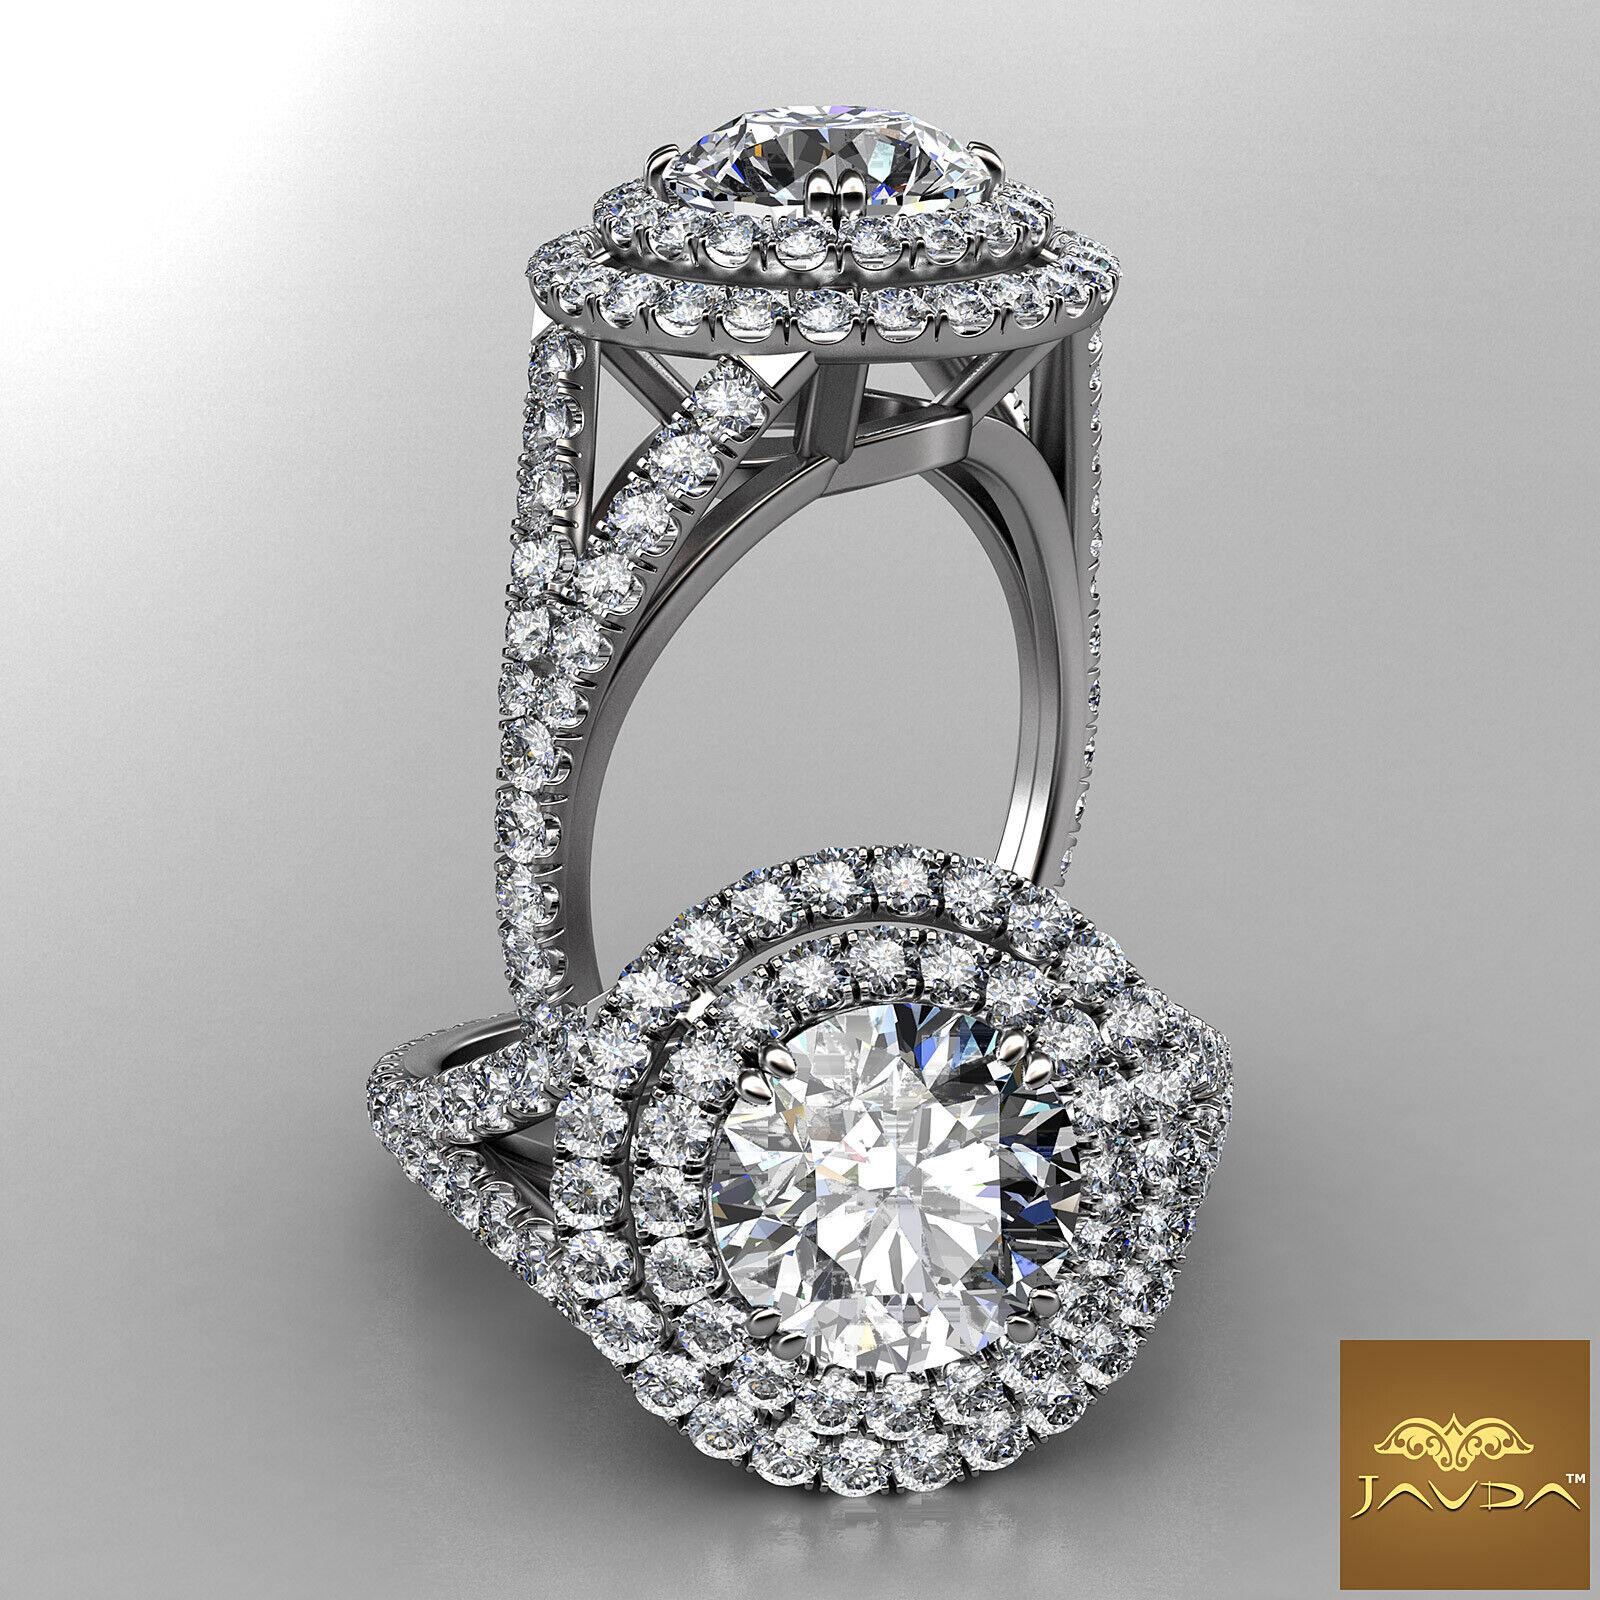 3.41ctw Double Halo Split Shank Round Diamond  Engagement Ring GIA I-VVS2 w Gold